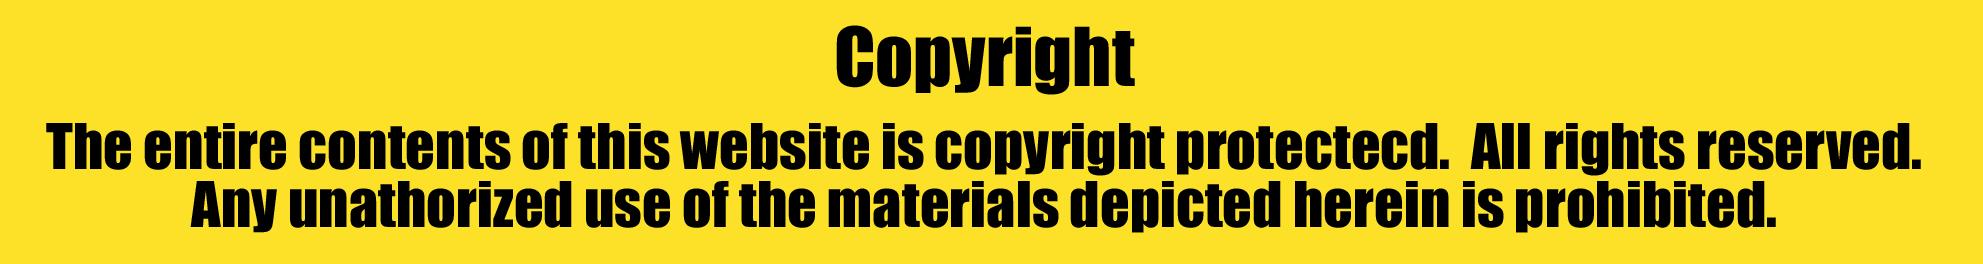 Website Copyright.jpg